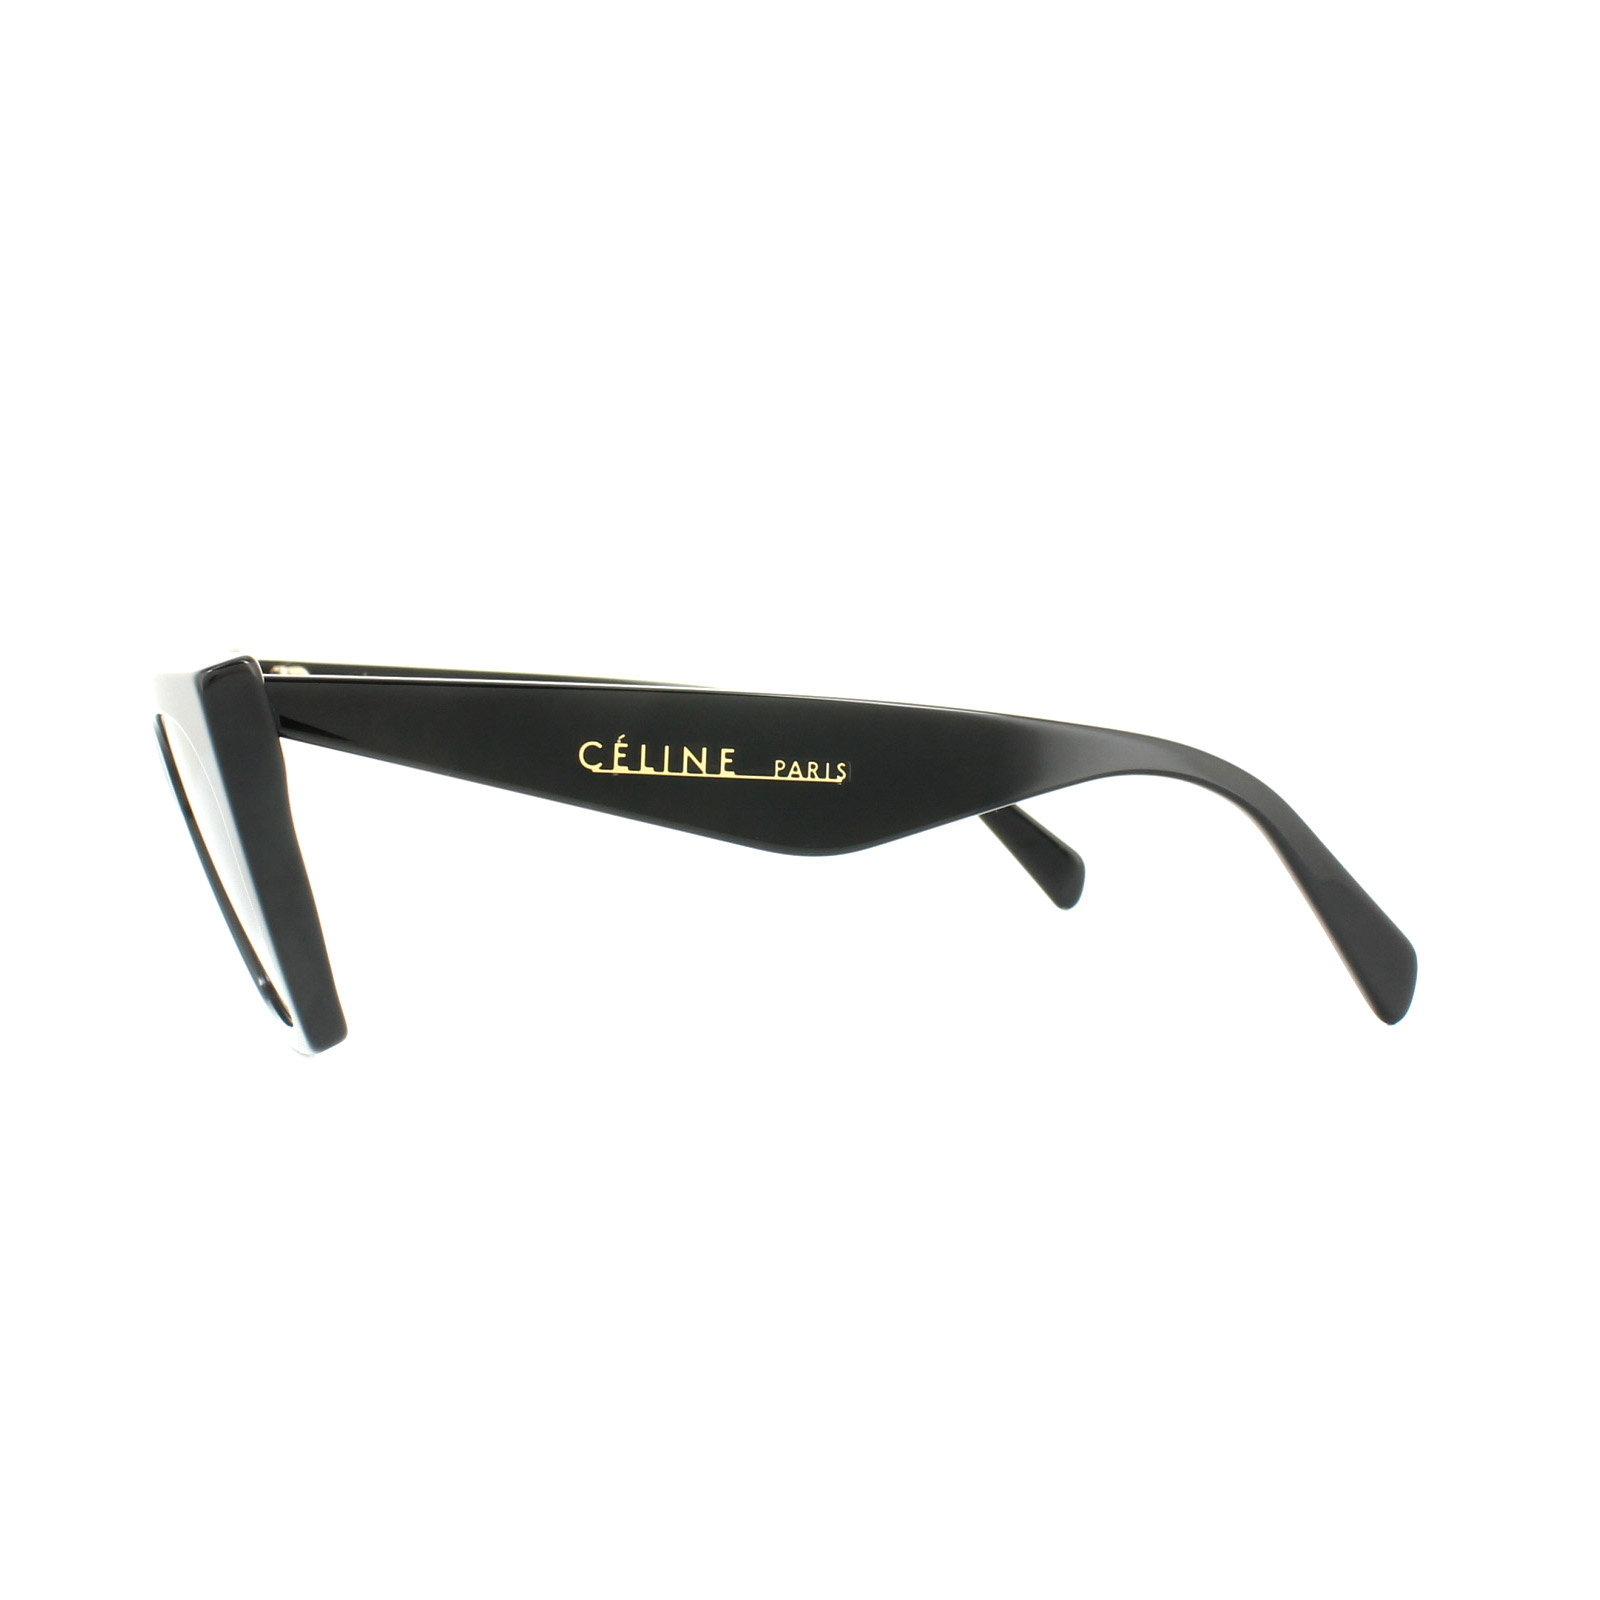 d744df7e33 Cheap Celine 41468 S Edge Sunglasses - Discounted Sunglasses